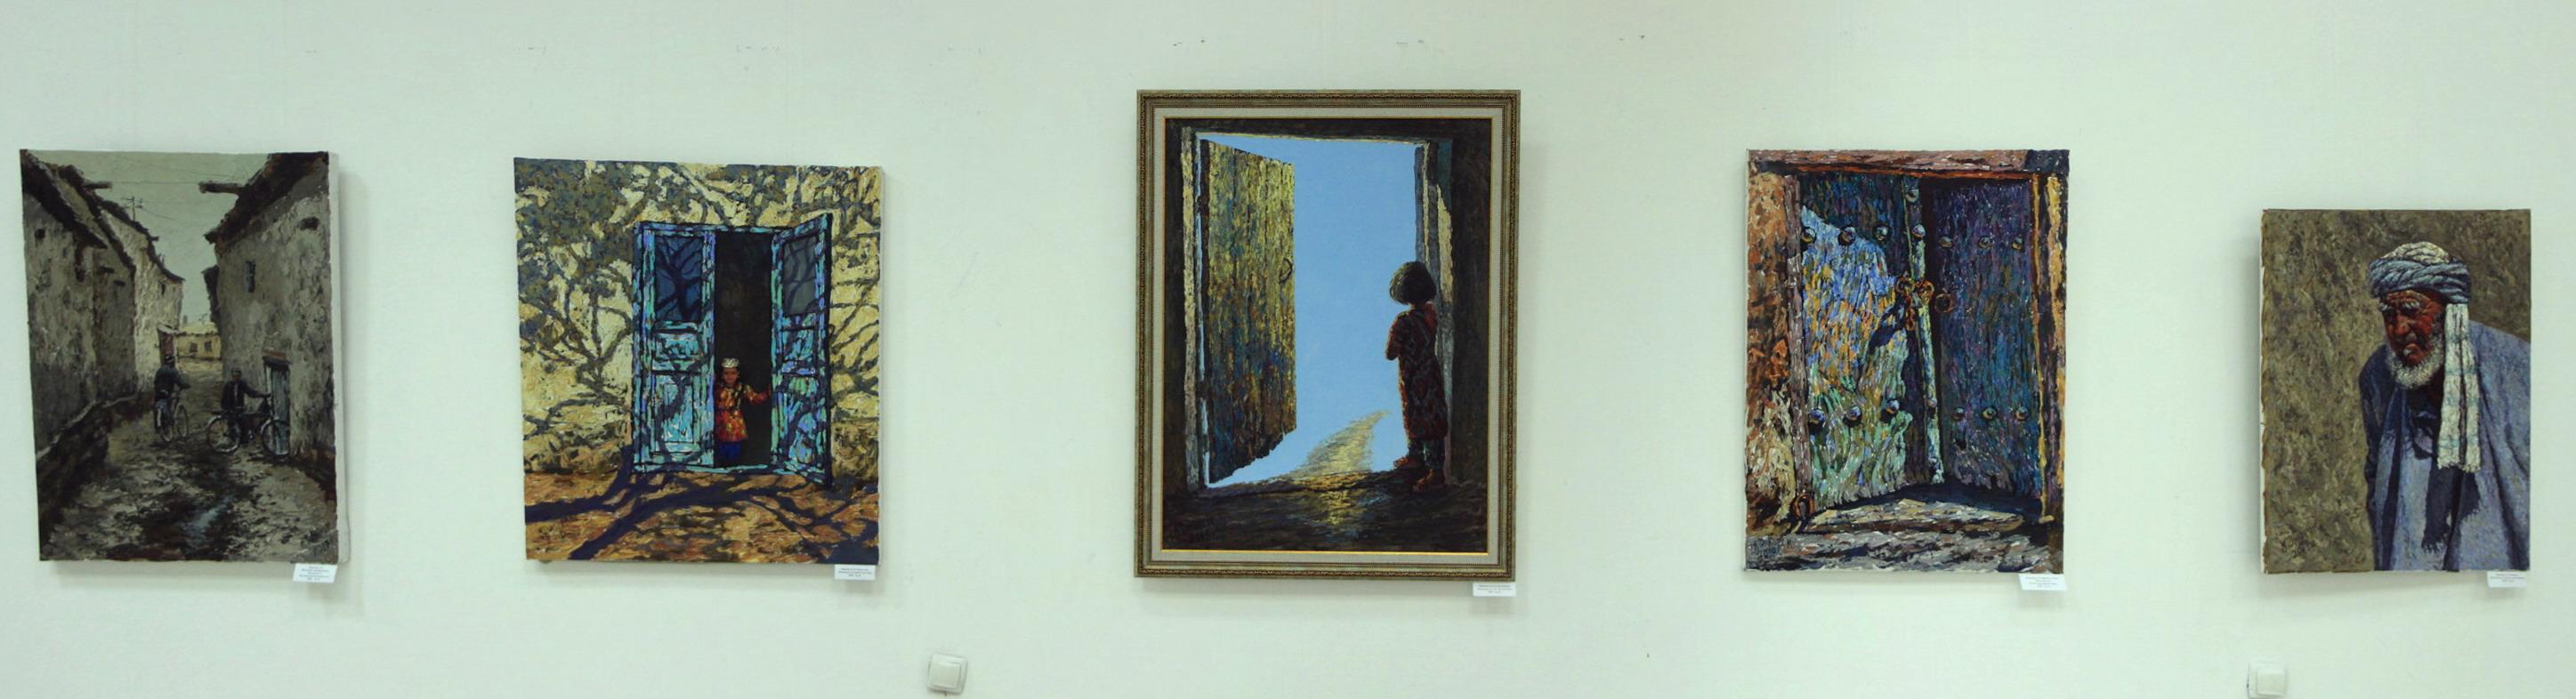 Дилором Мамедова. Экспозиция картин.